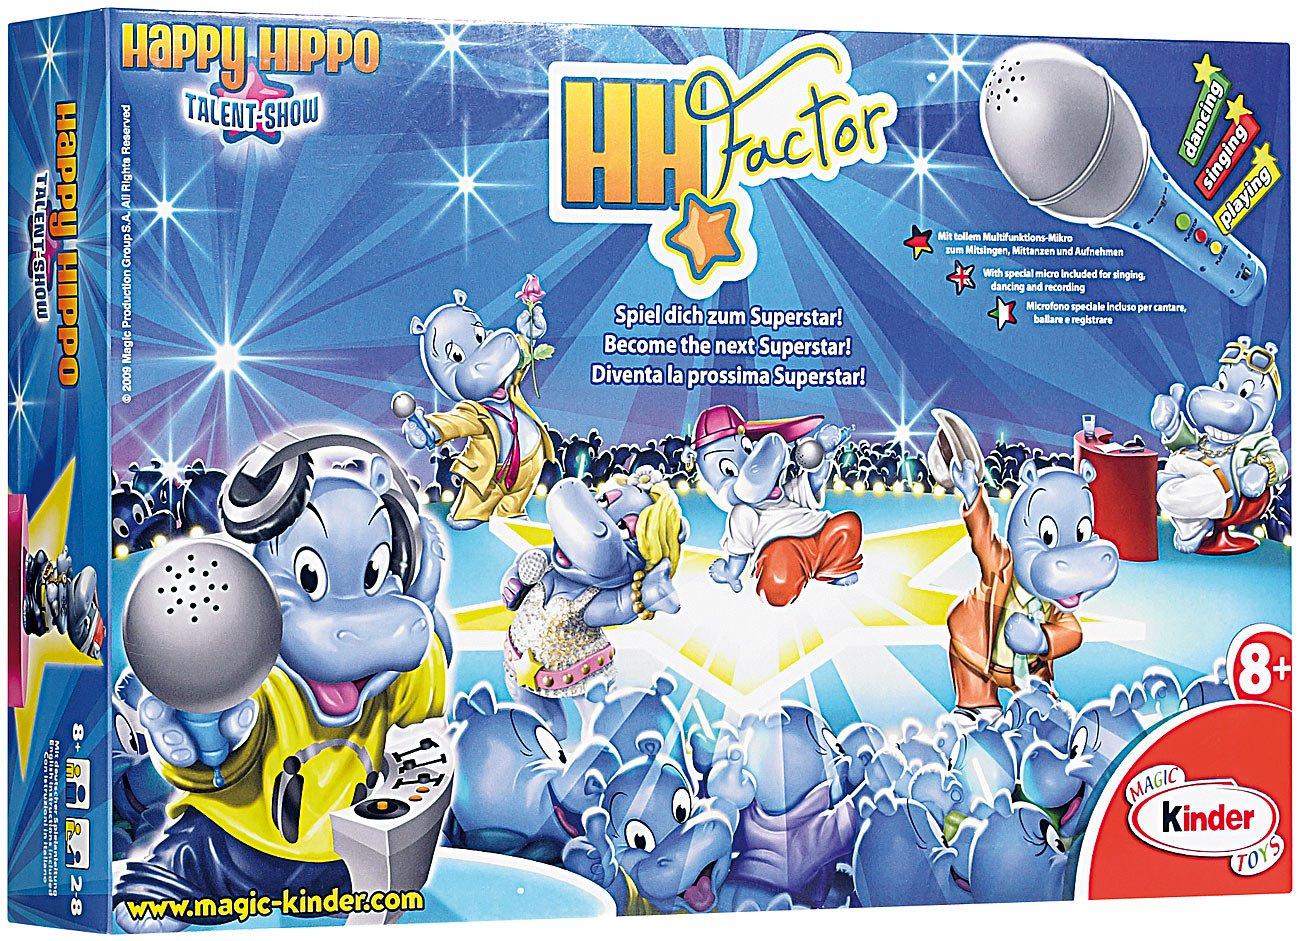 Happy Hippo Karaoke-Set Magic Kinder Toys